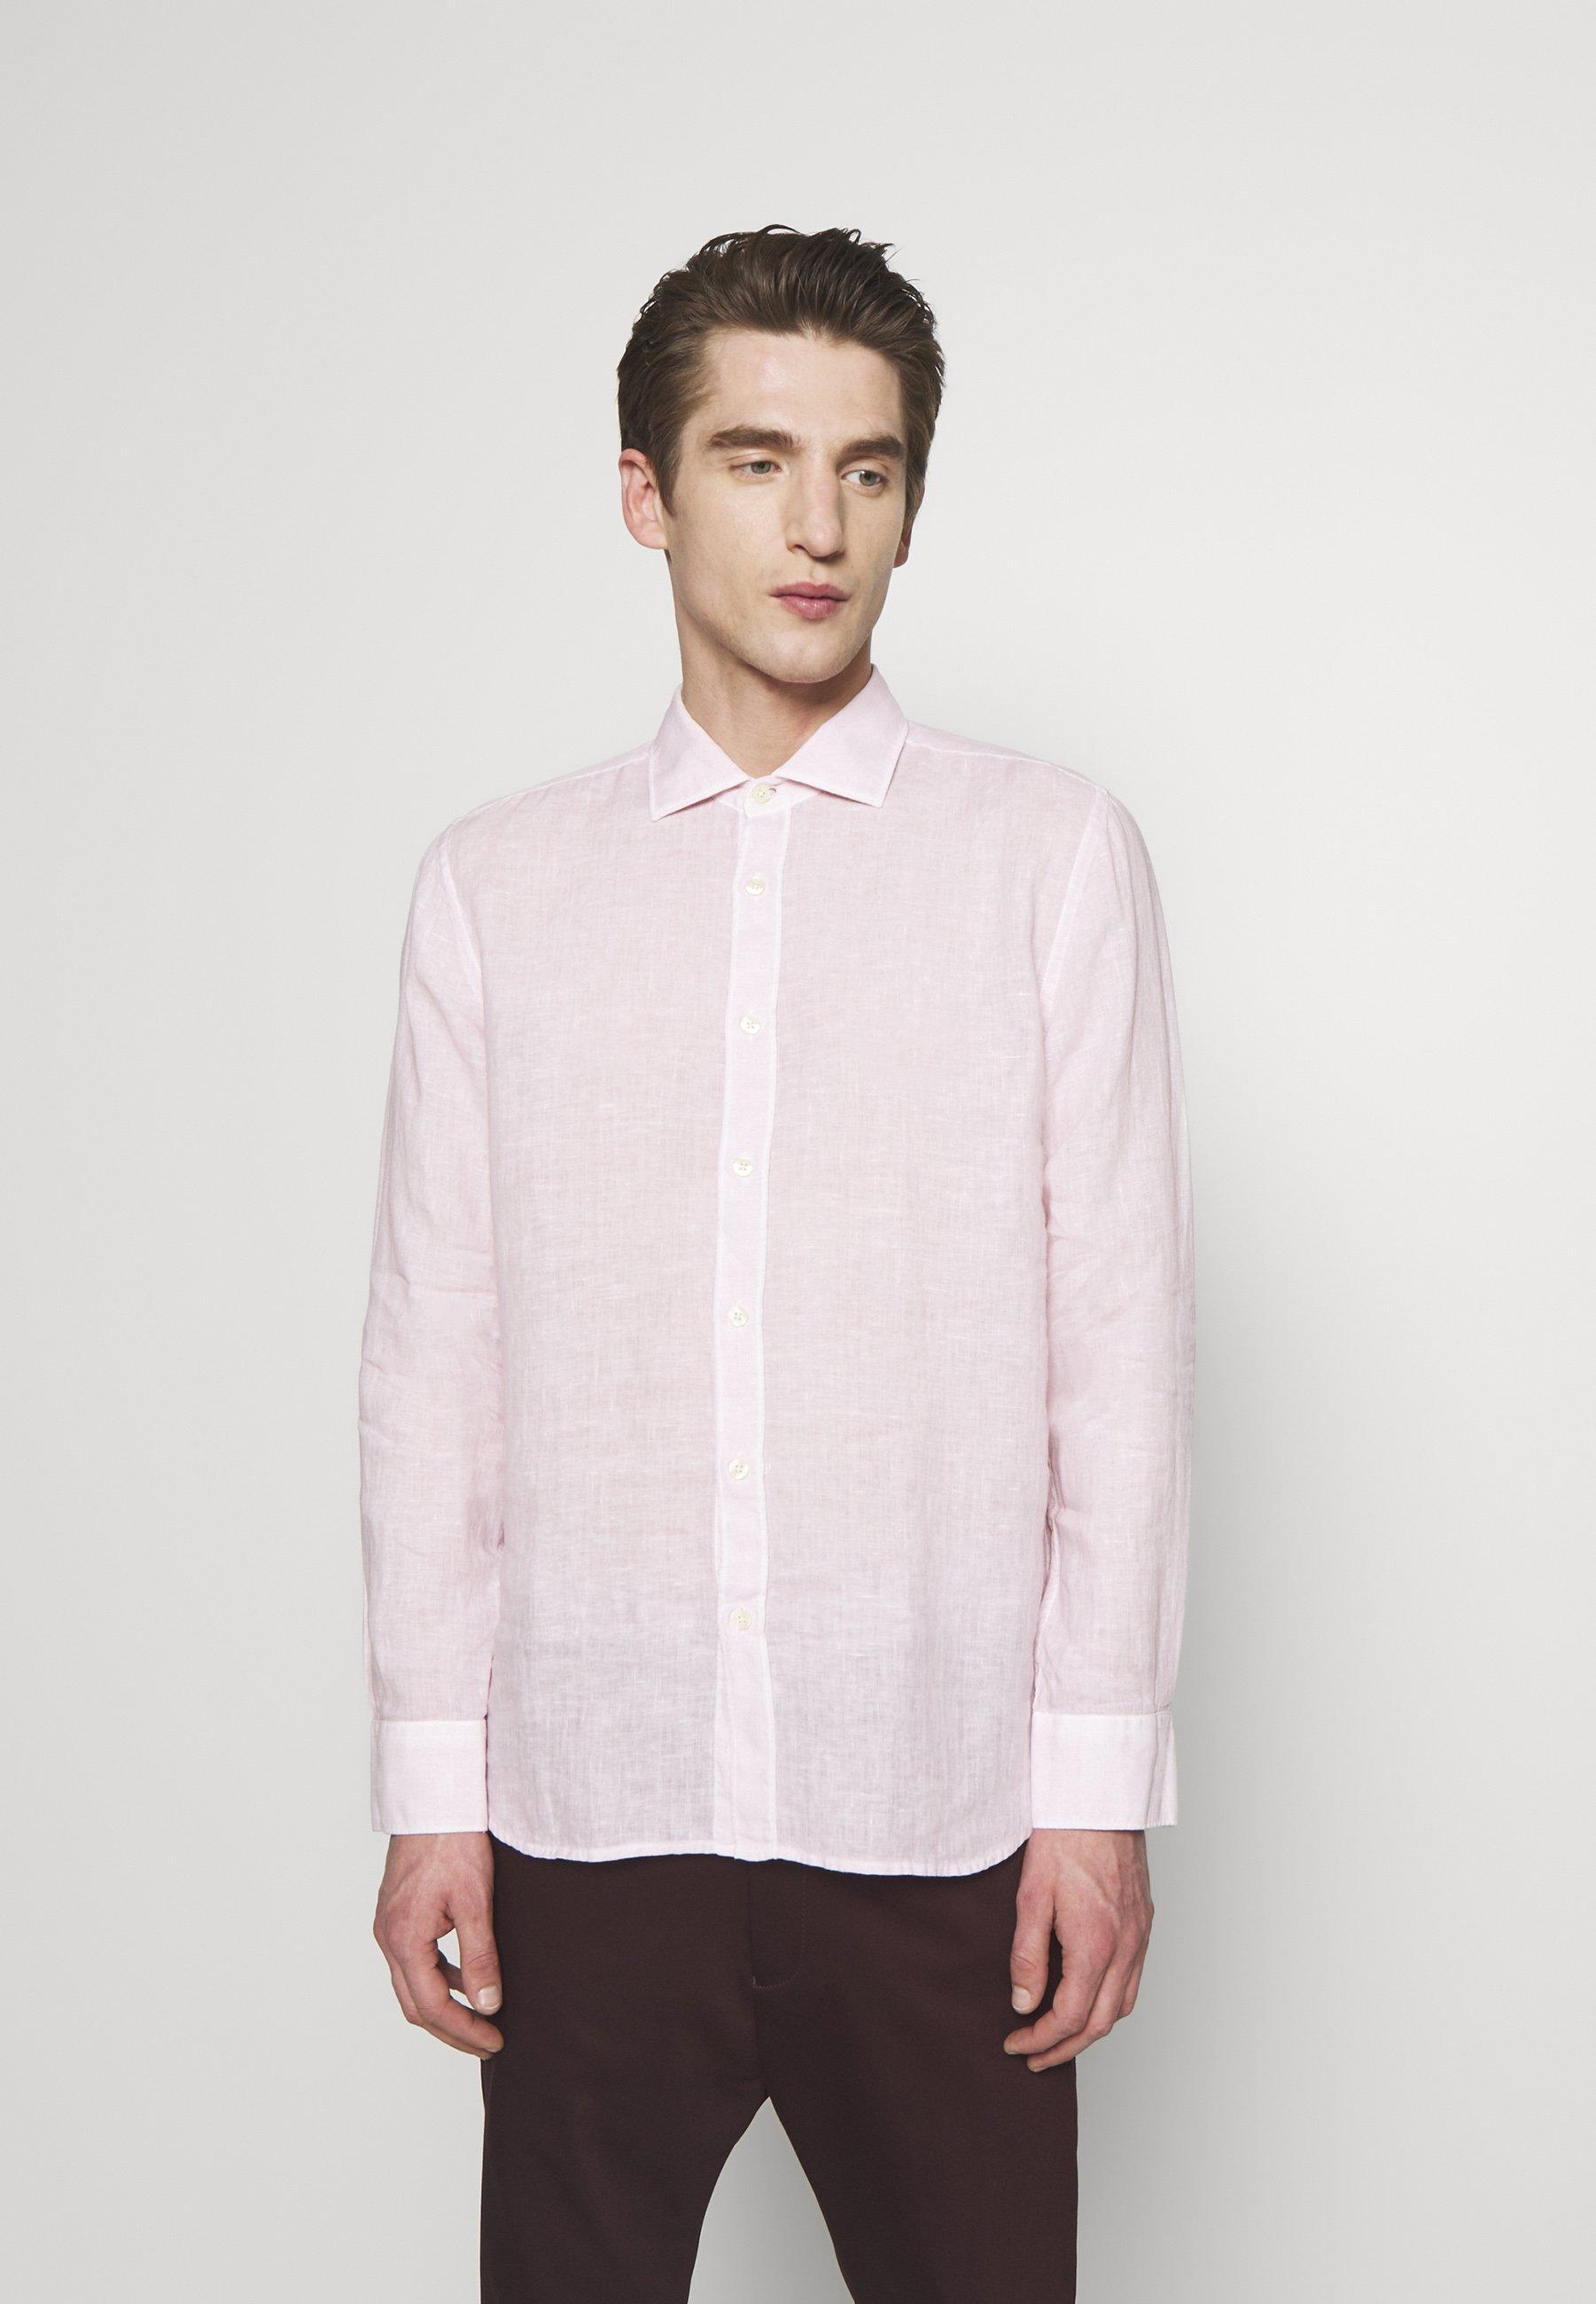 120% Lino Hemd - pink soft fade | Herrenbekleidung 2020